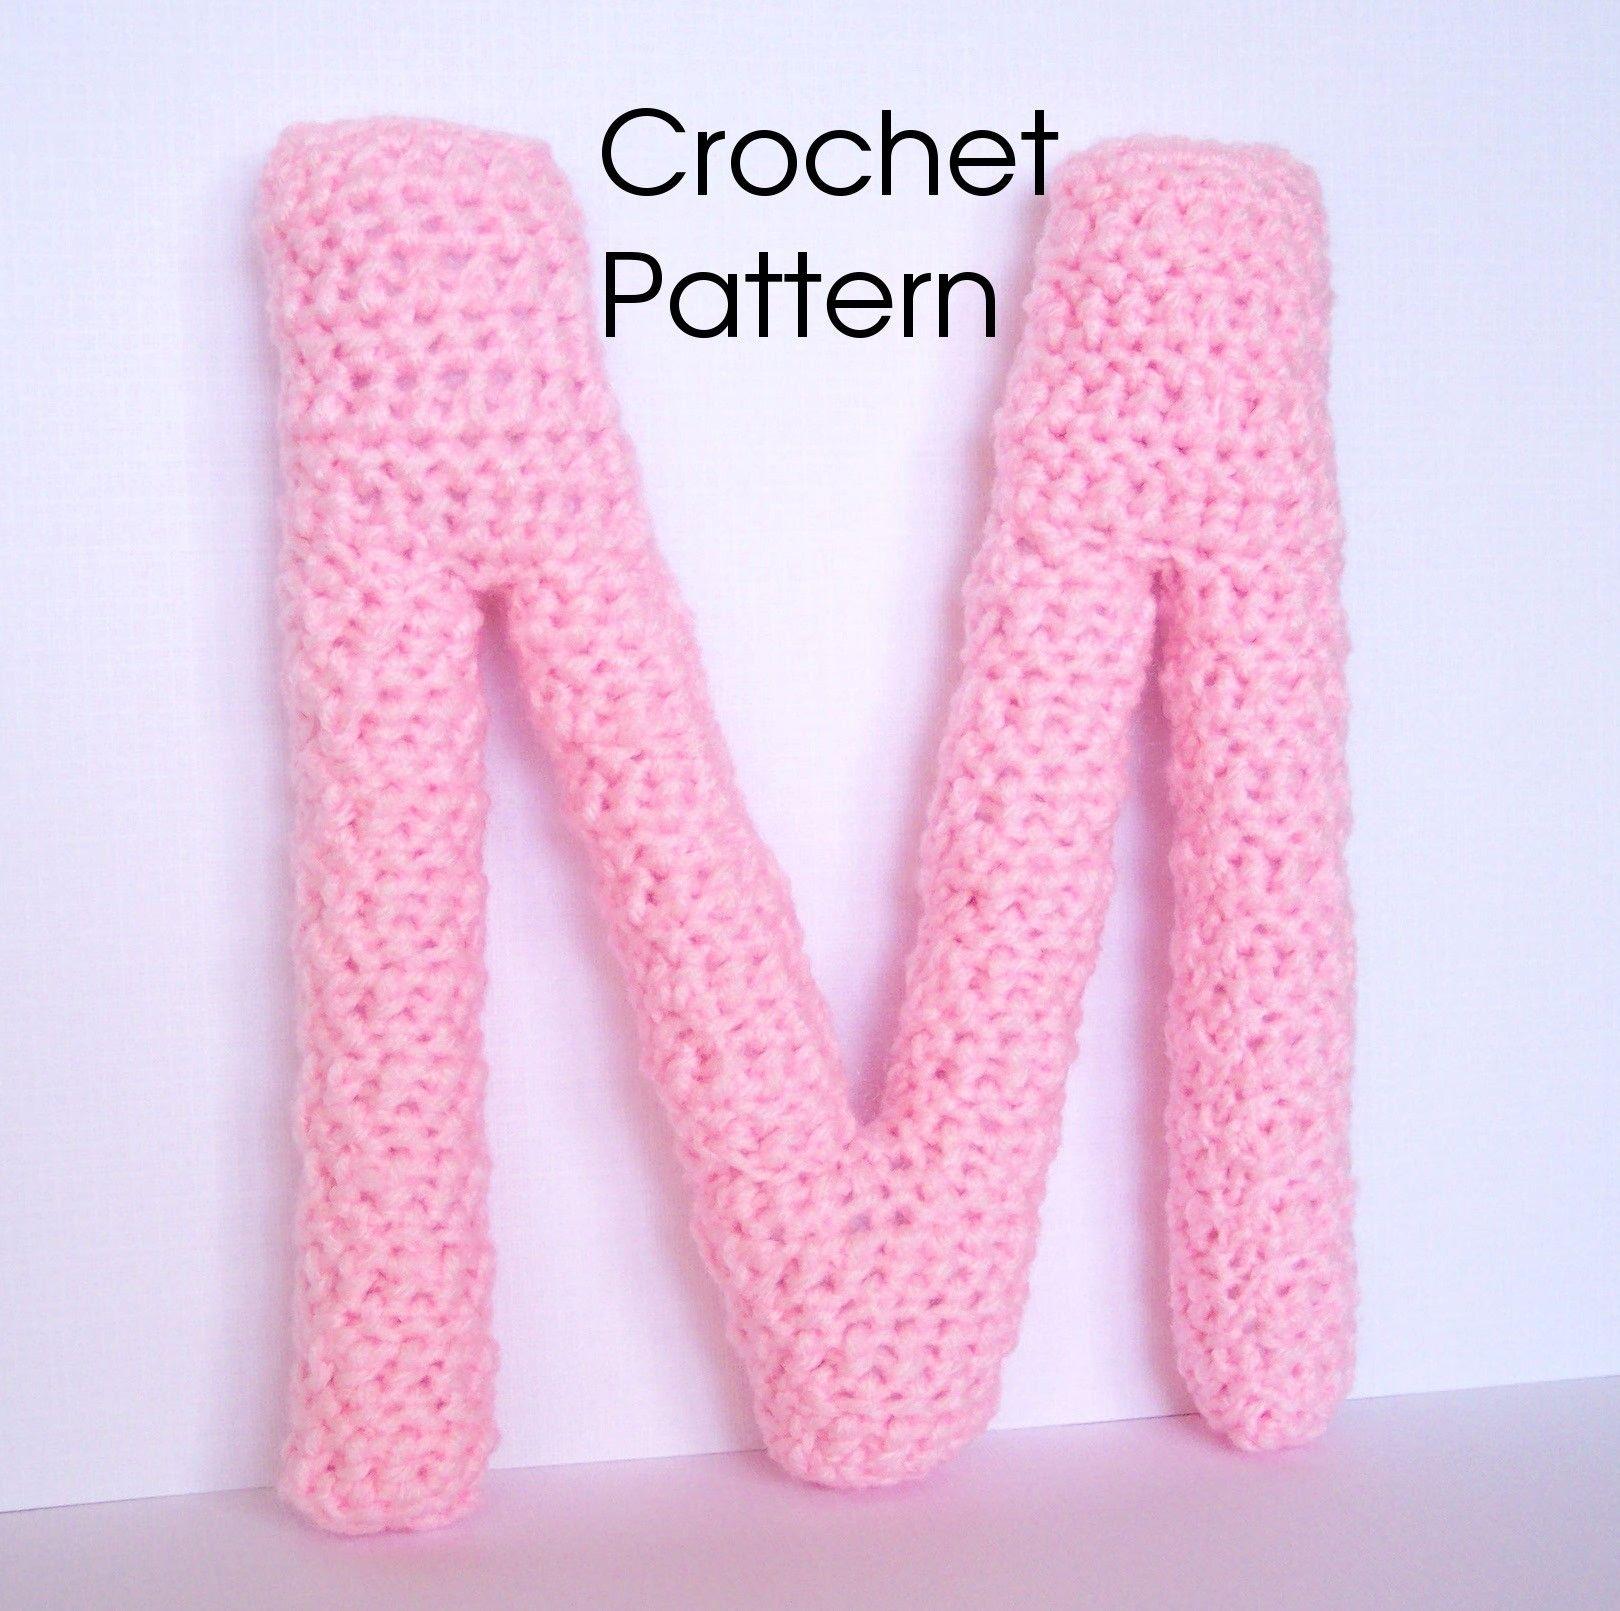 Free crochet alphabet pattern crochet tutorials crochet pillows free crochet alphabet pattern crochet tutorials thecheapjerseys Choice Image